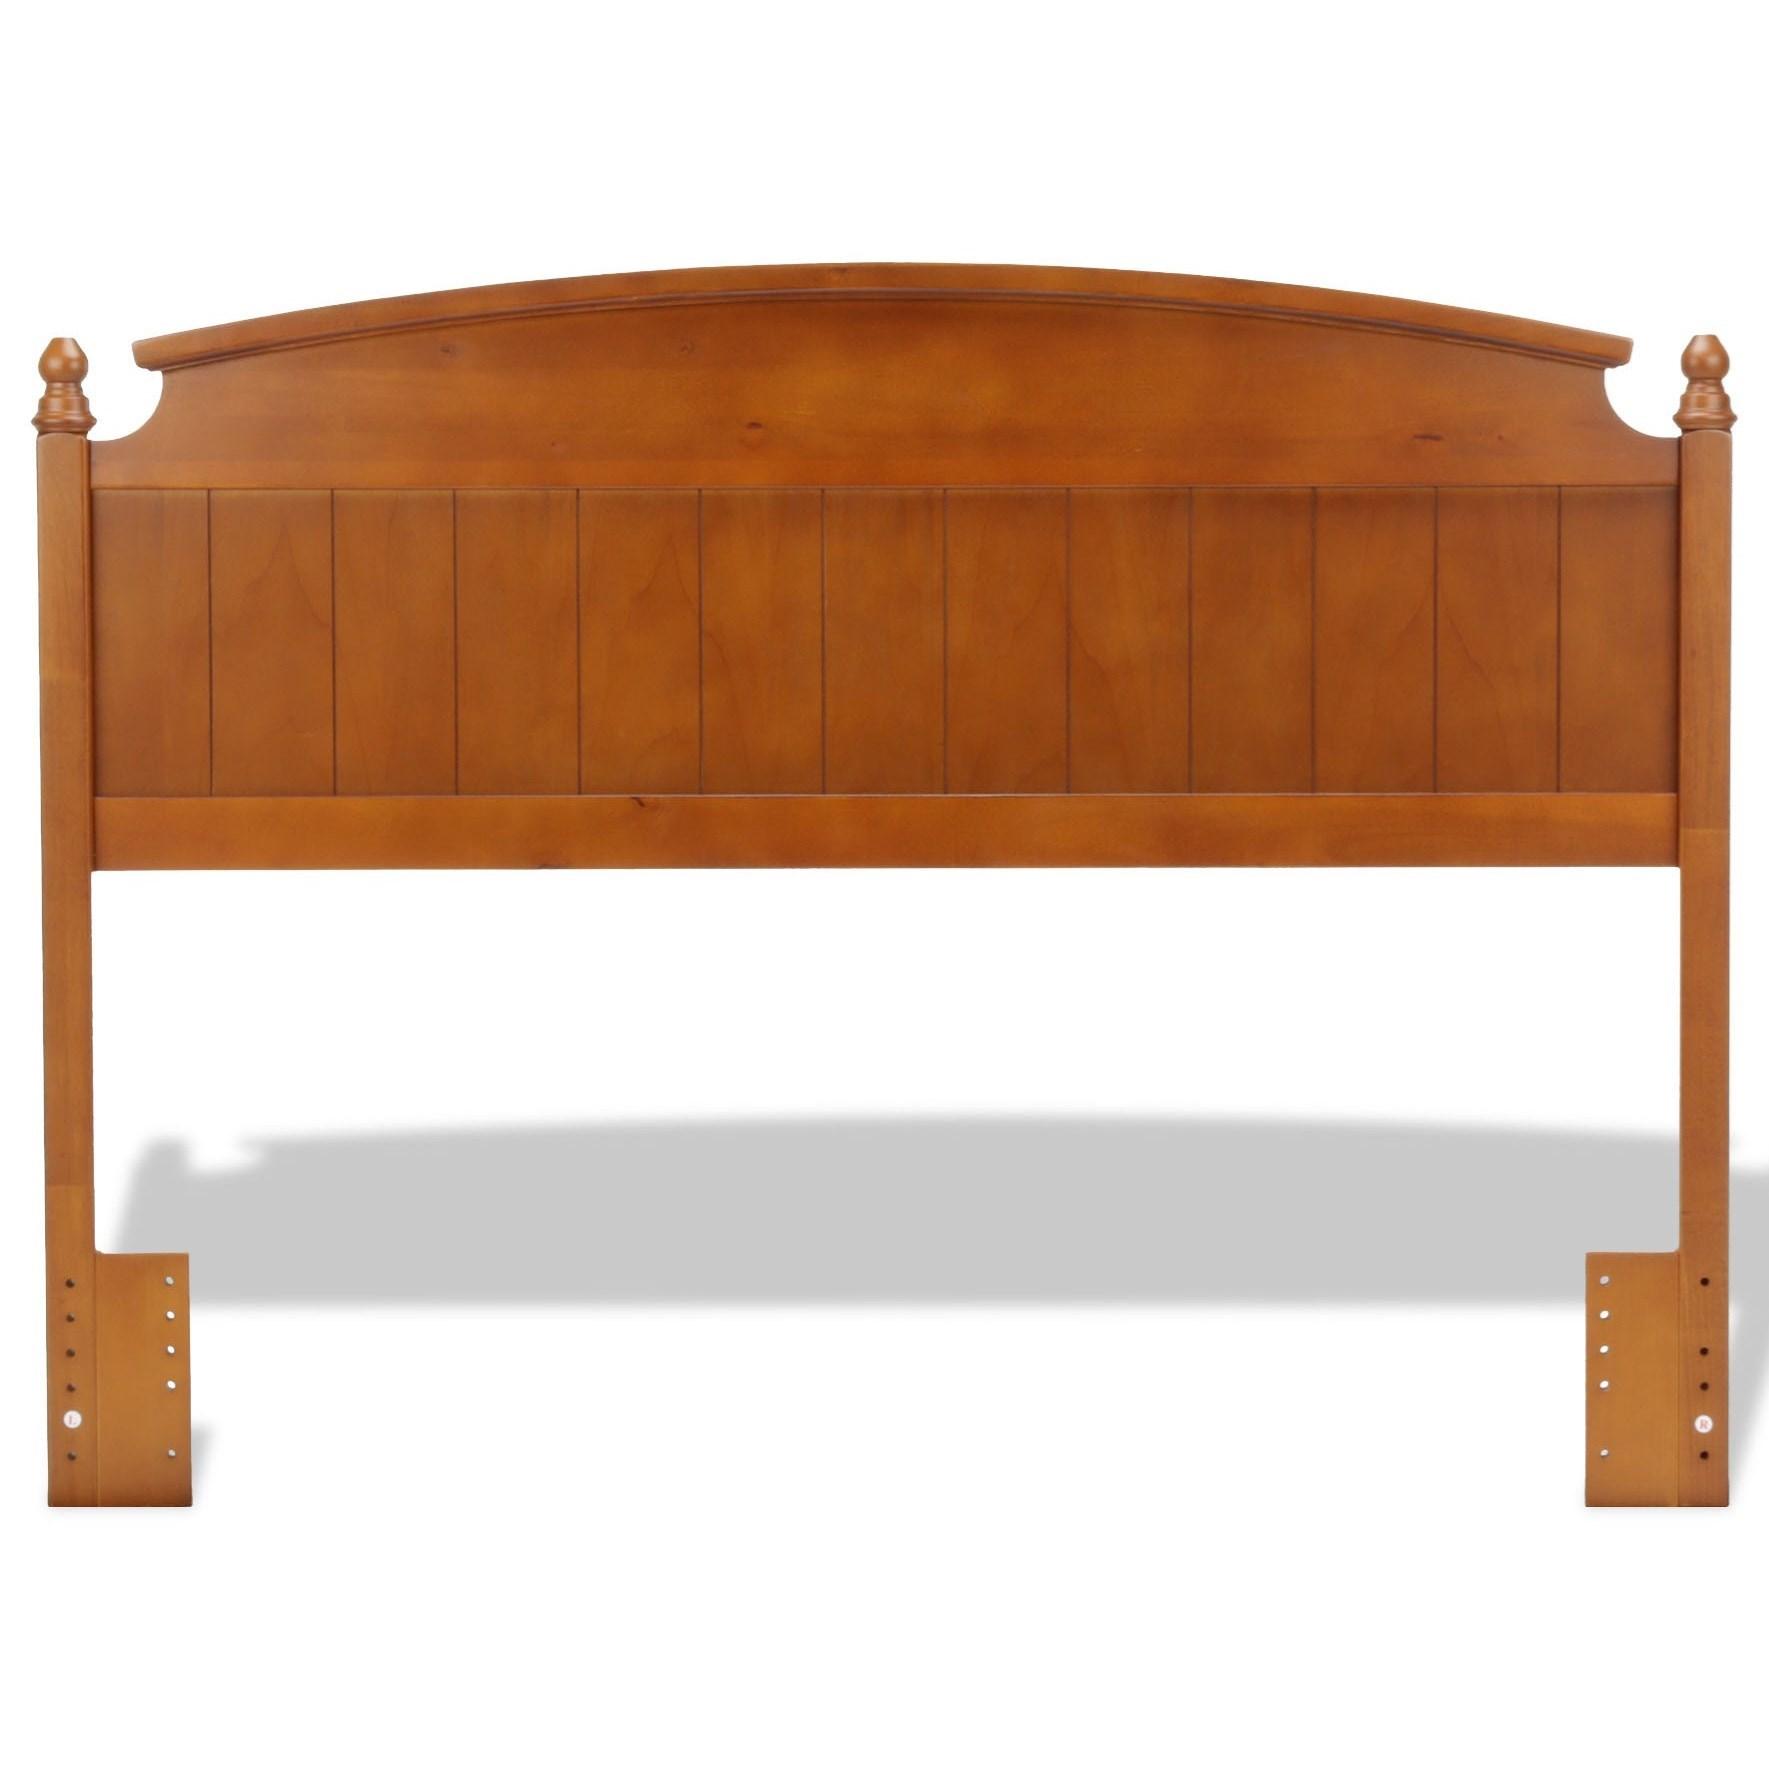 Fashion Bed Group Wood BedsFull/Queen Danbury Headboard ...